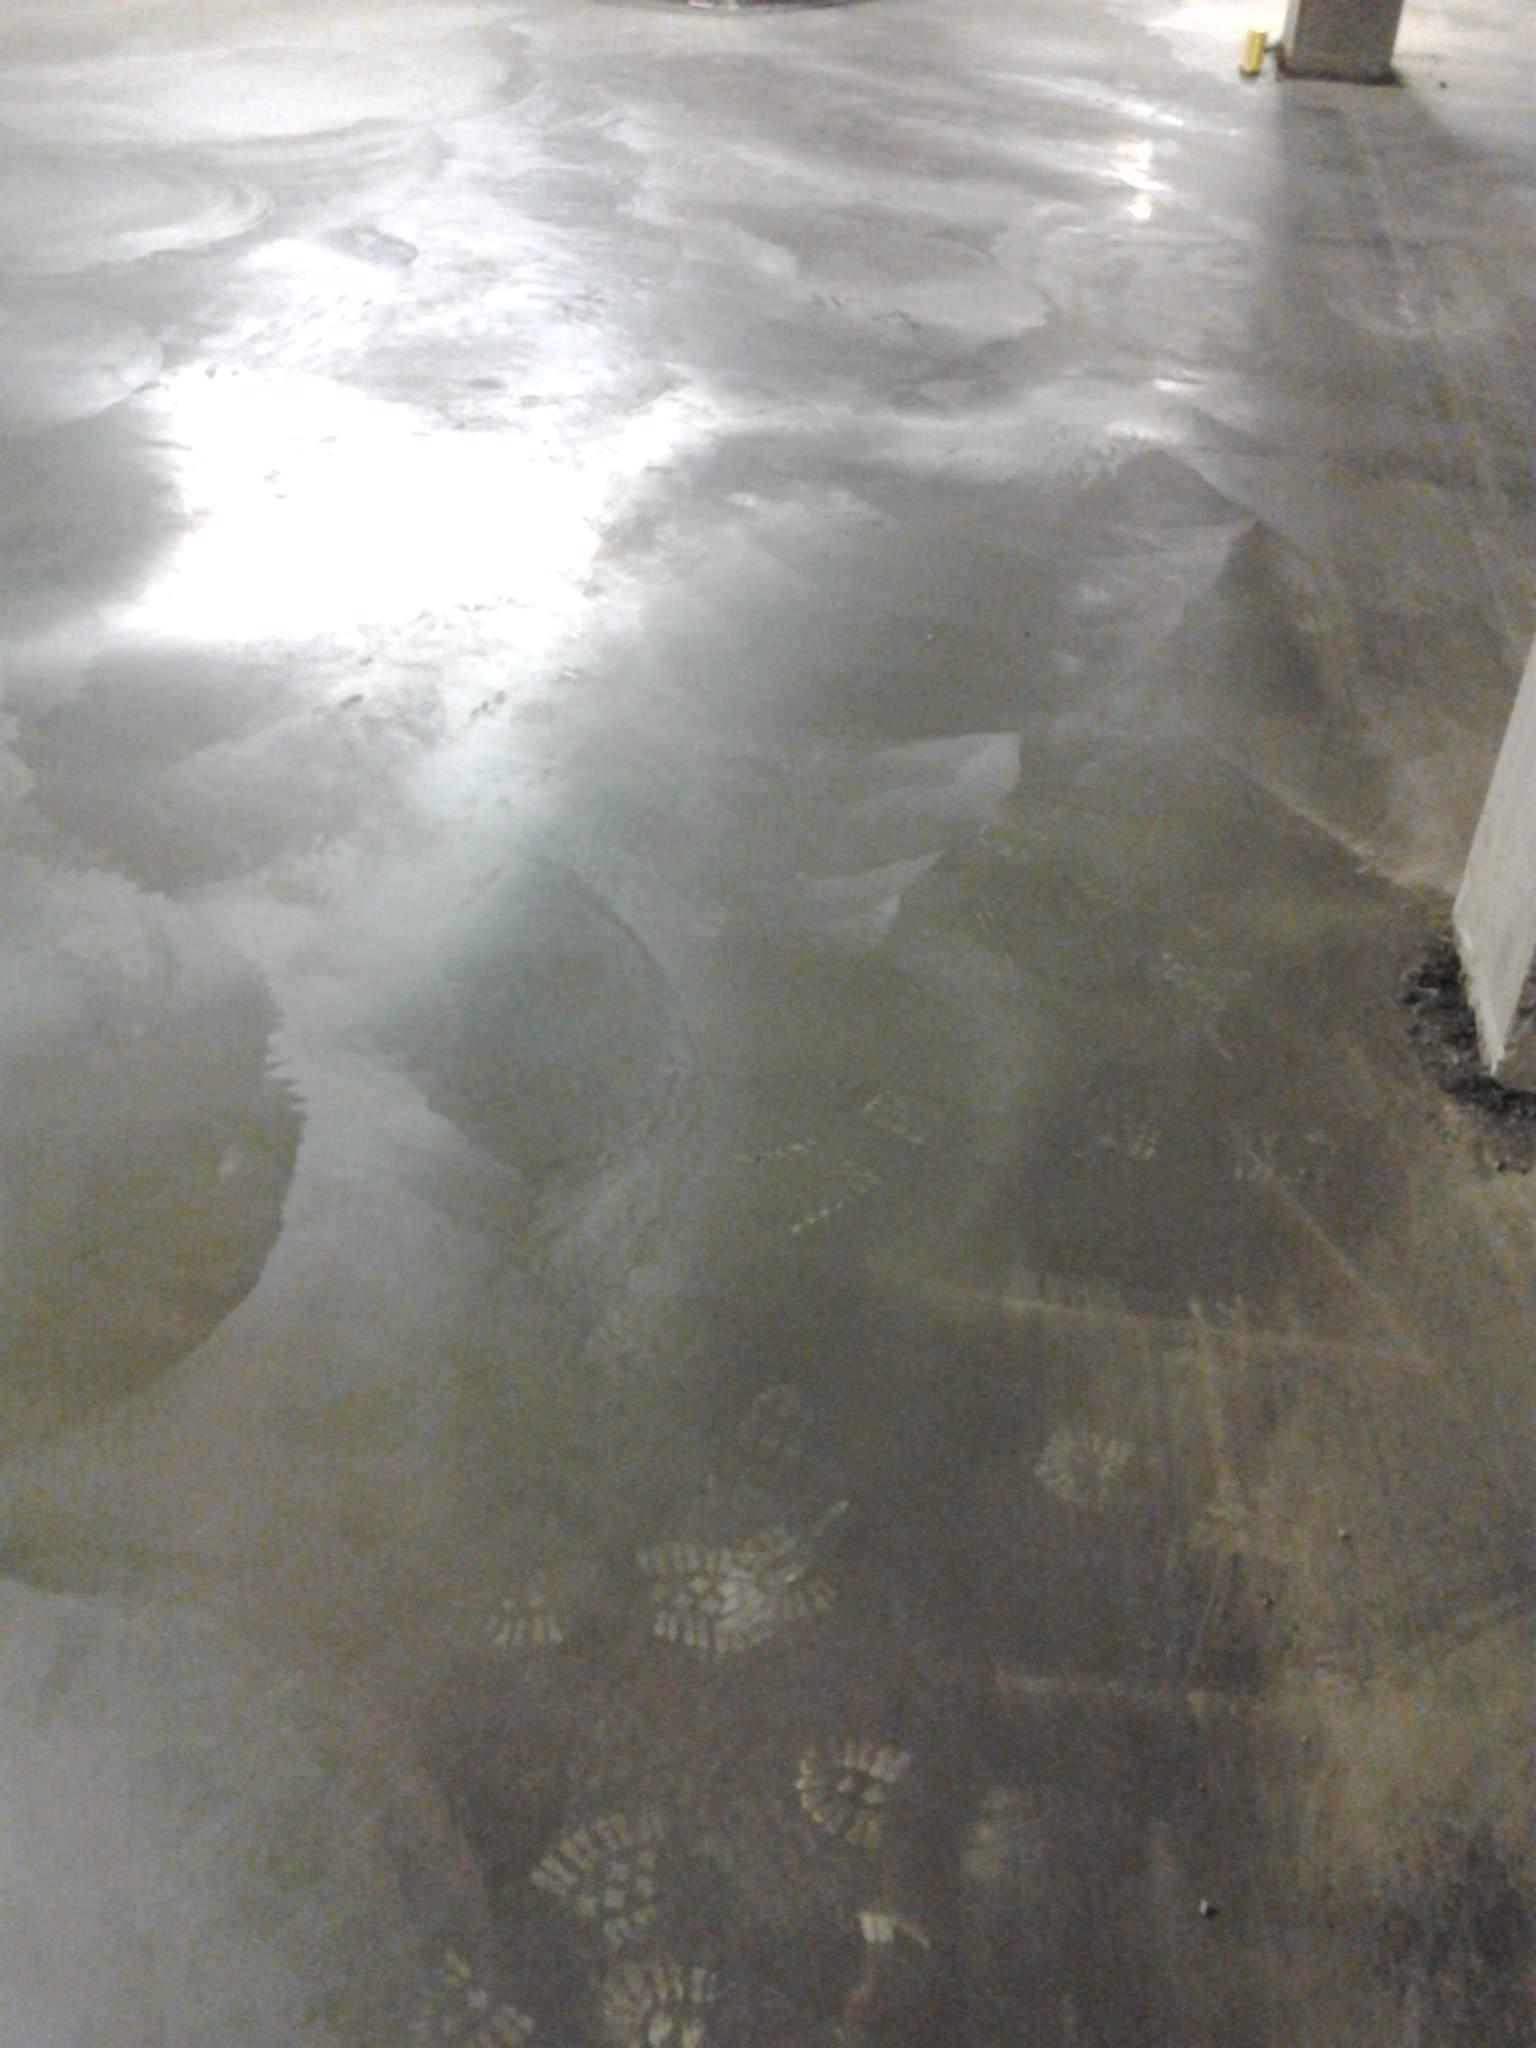 http://www.basesolide.ca/wp-content/uploads/2015/10/joint-de-ciment-poli.jpg